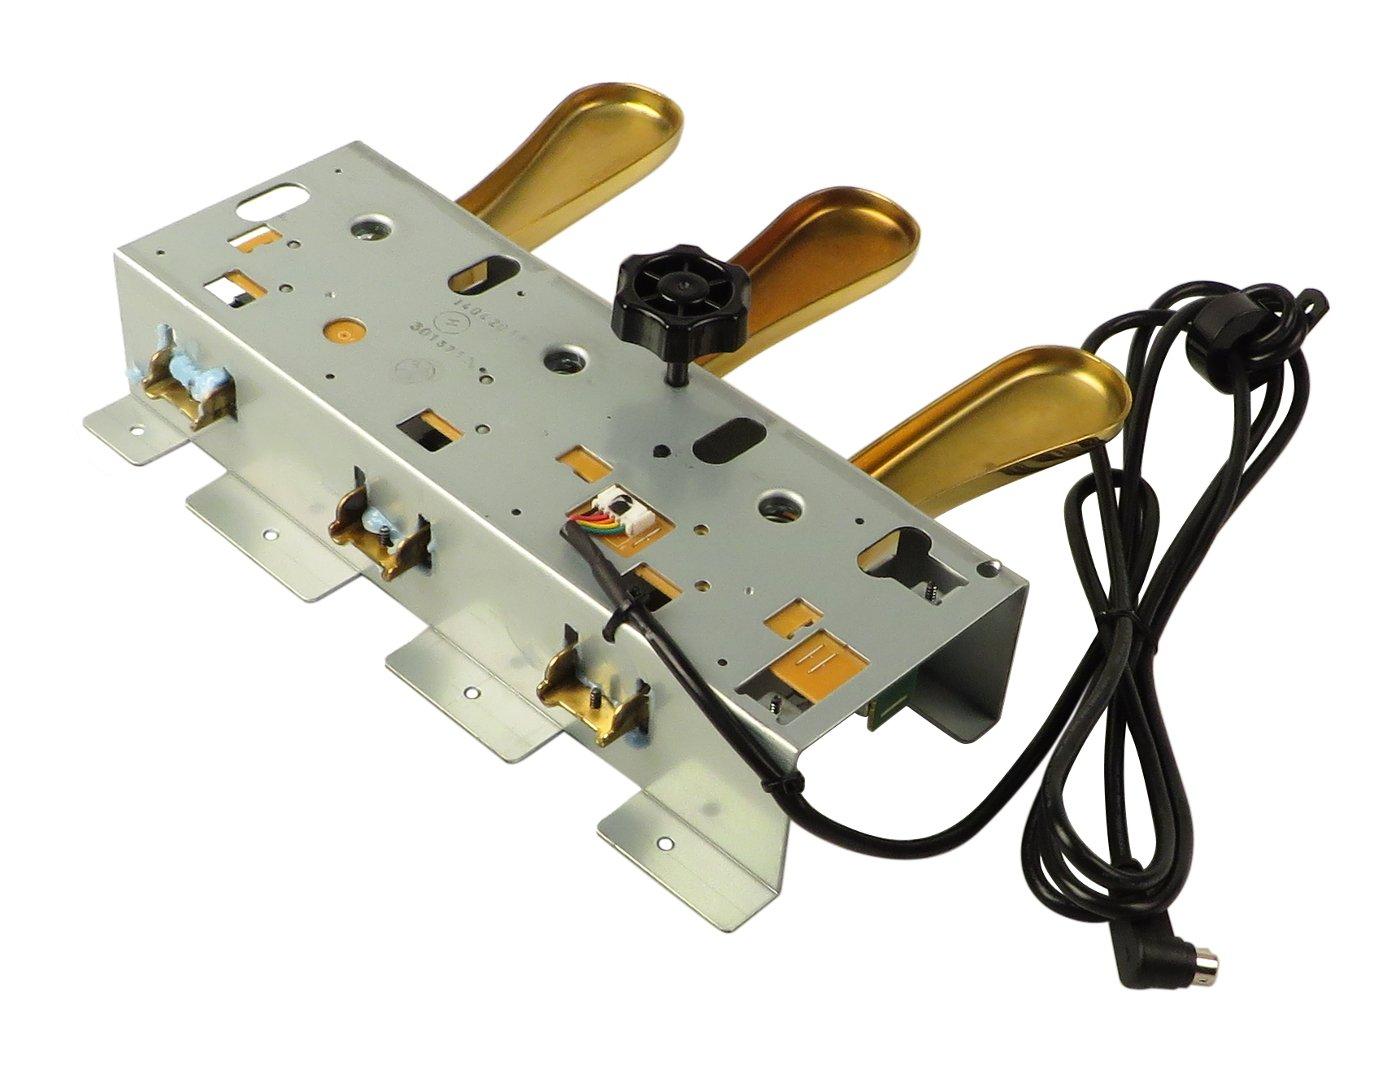 Pedal Assembly for Clavinova CLP-230, CLP-330, CLP-880